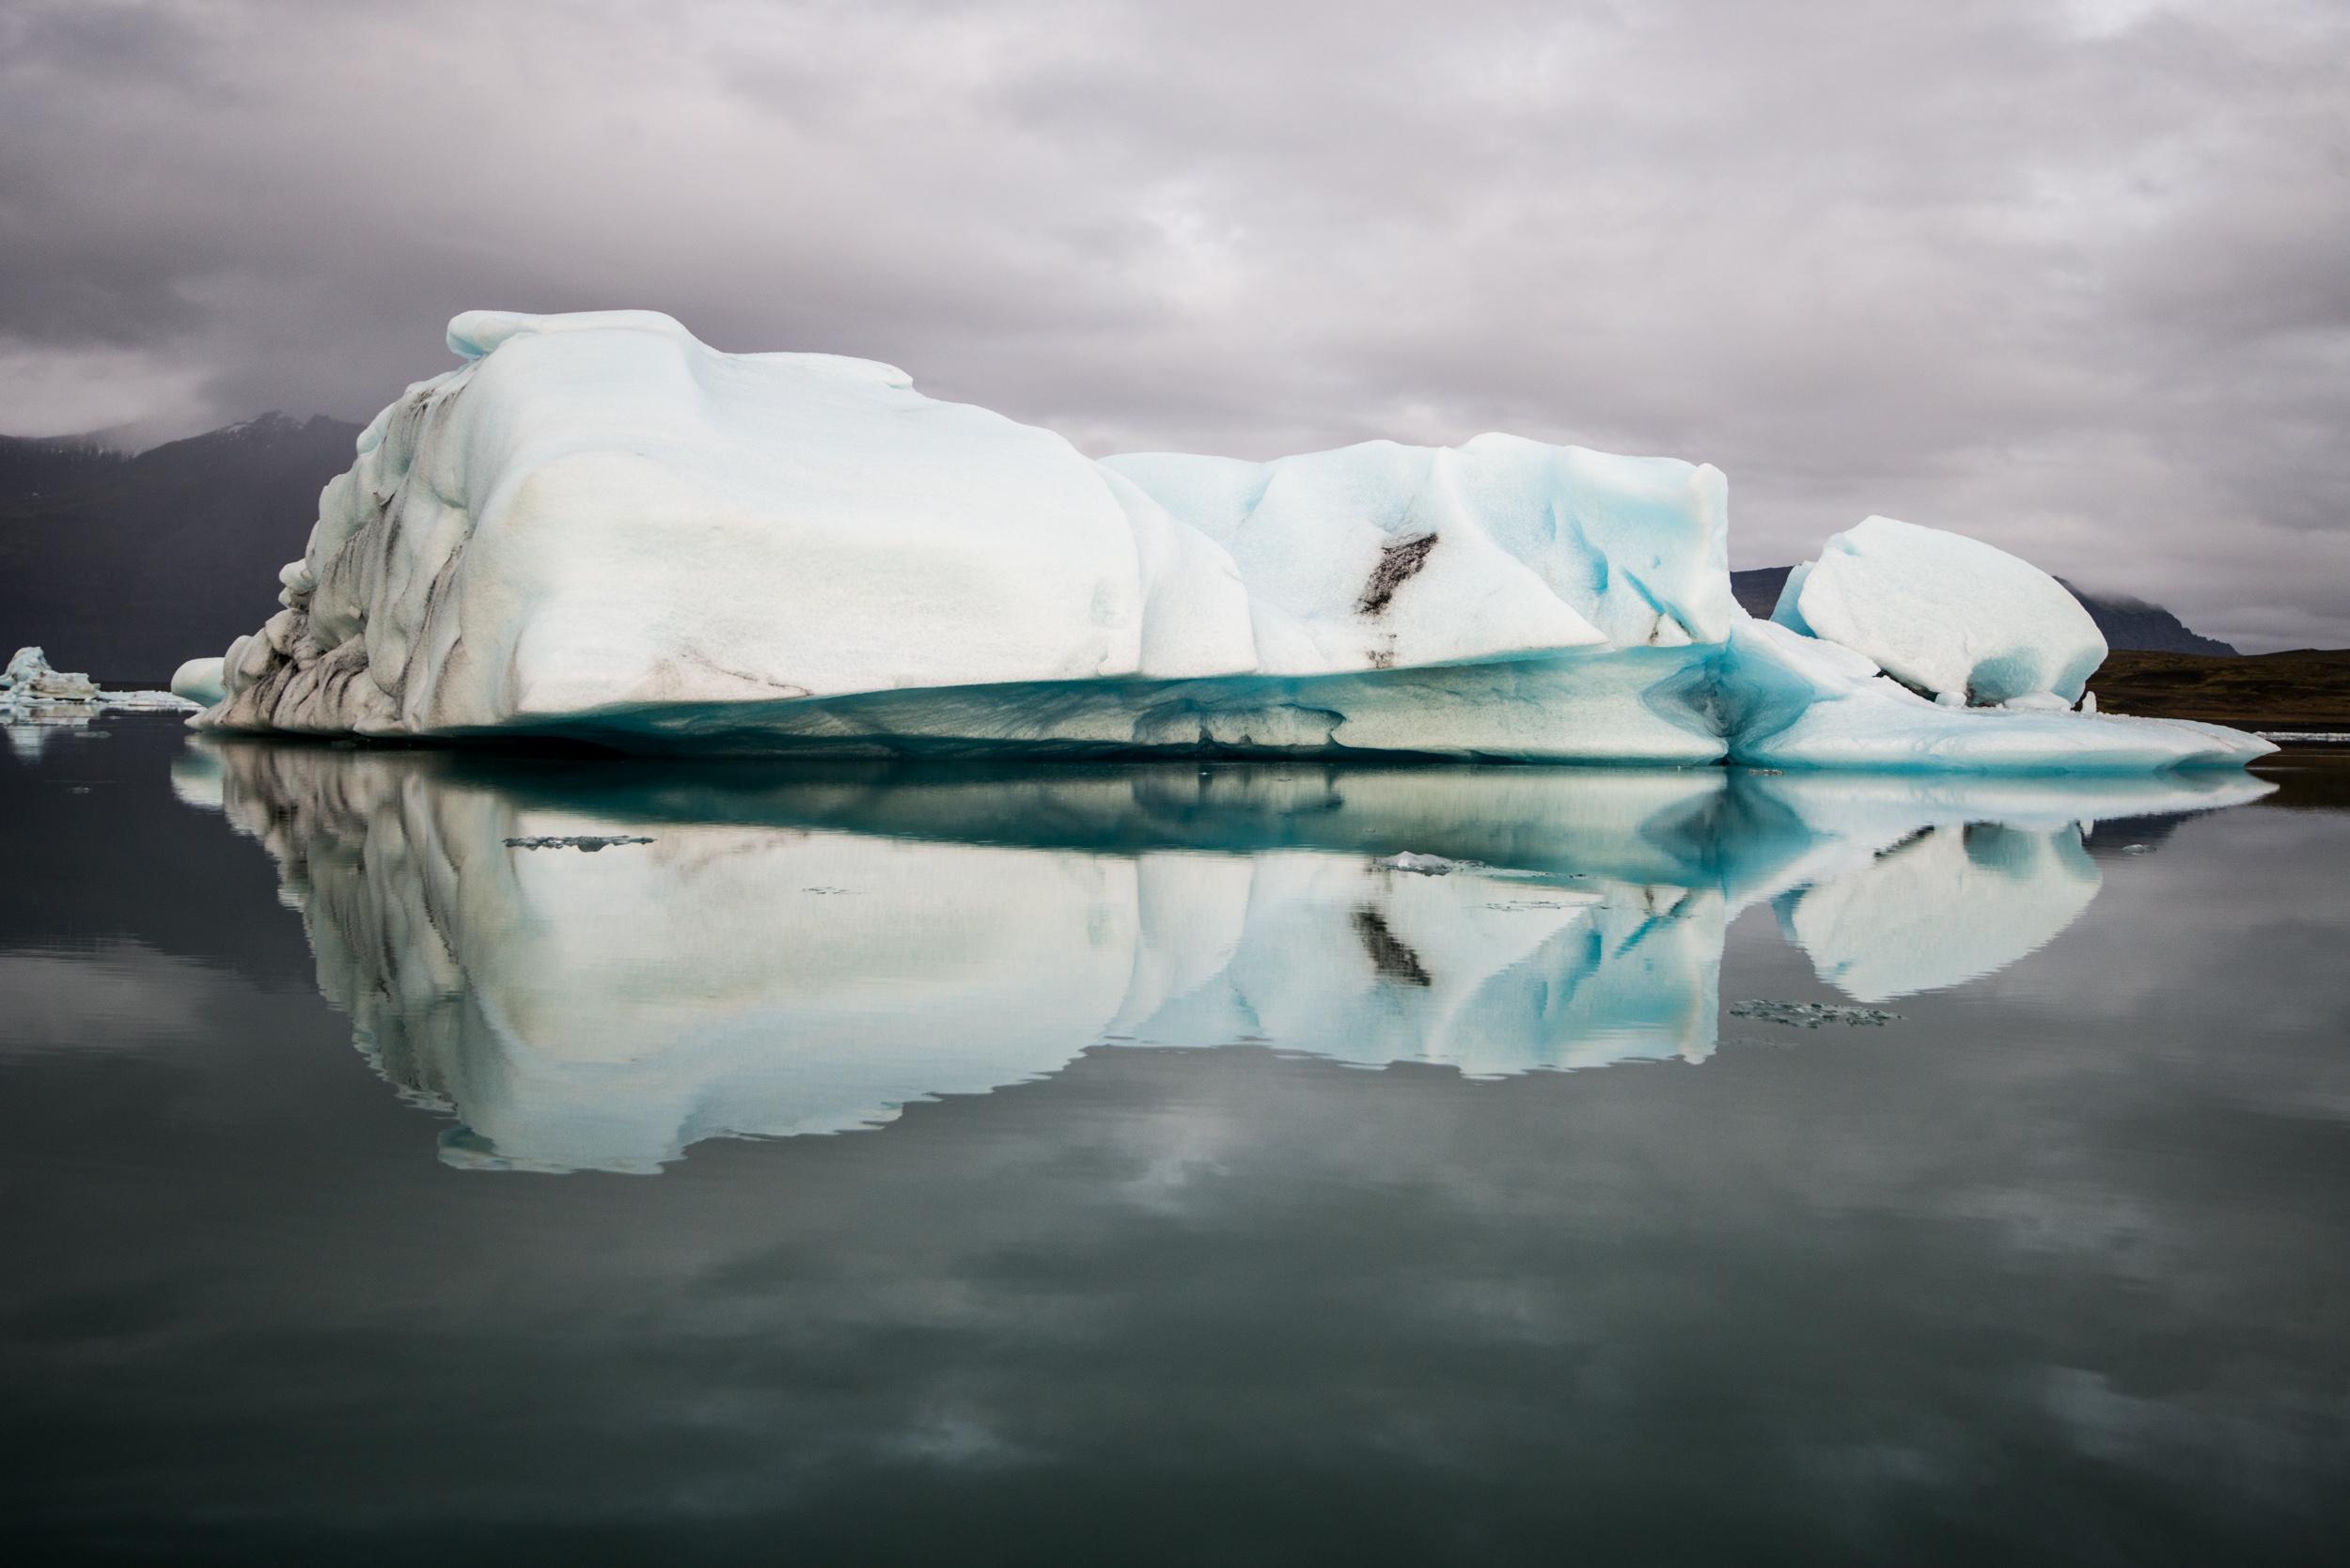 Jökulsárlón 'Glacier Lagoon' is every bit as incredible as everyone makes out.